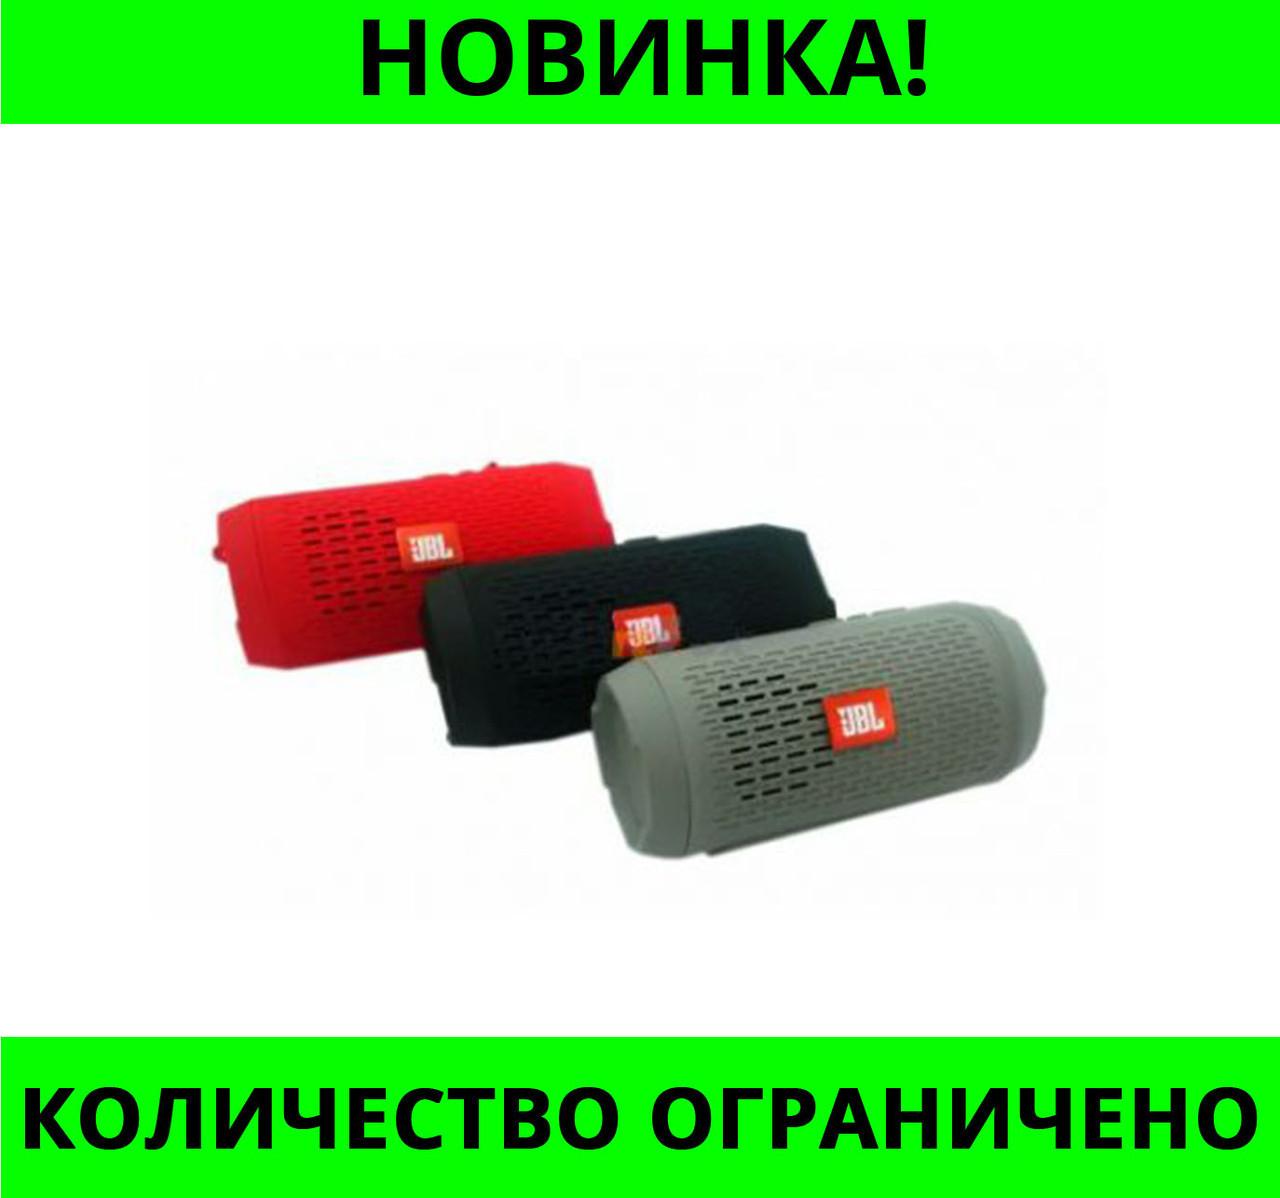 SALE! Портативная Bluetooth колонка JВL FD-1